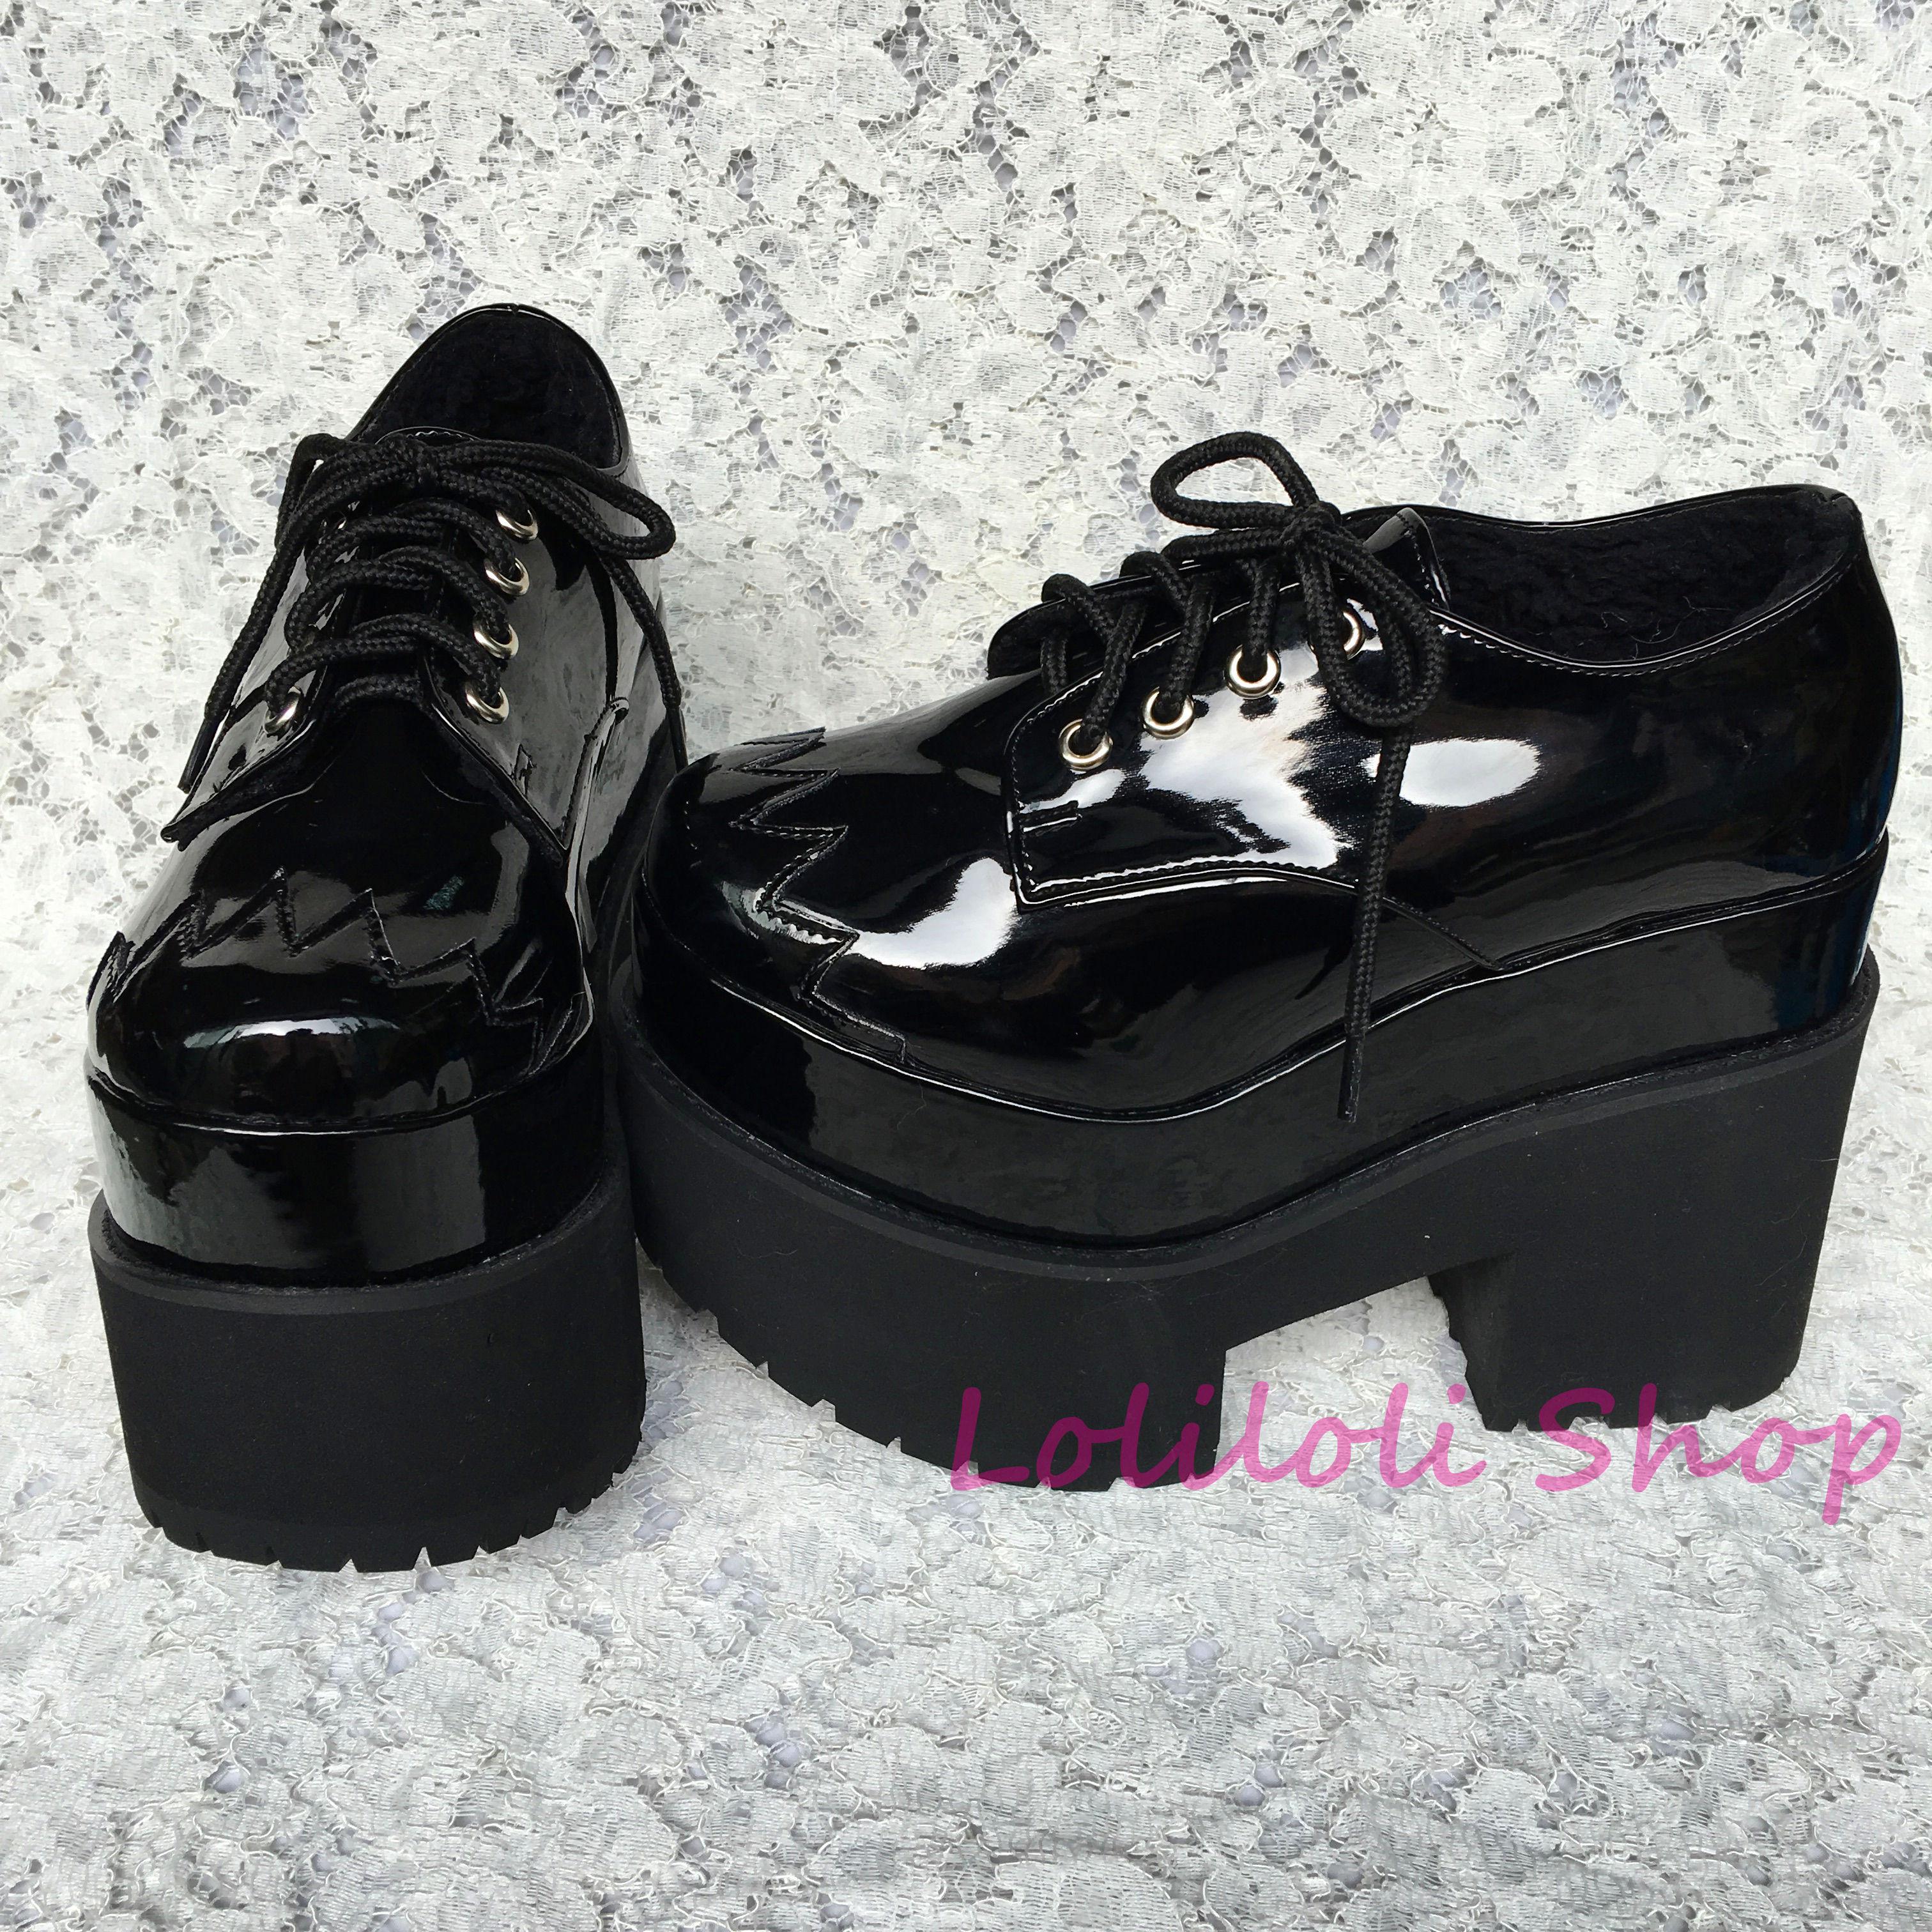 все цены на  Princess sweet gothic lolita shoes Loliloliyoyo antaina Japanese design shoes custom black bright skin thick heel shoes 5018s-1  в интернете